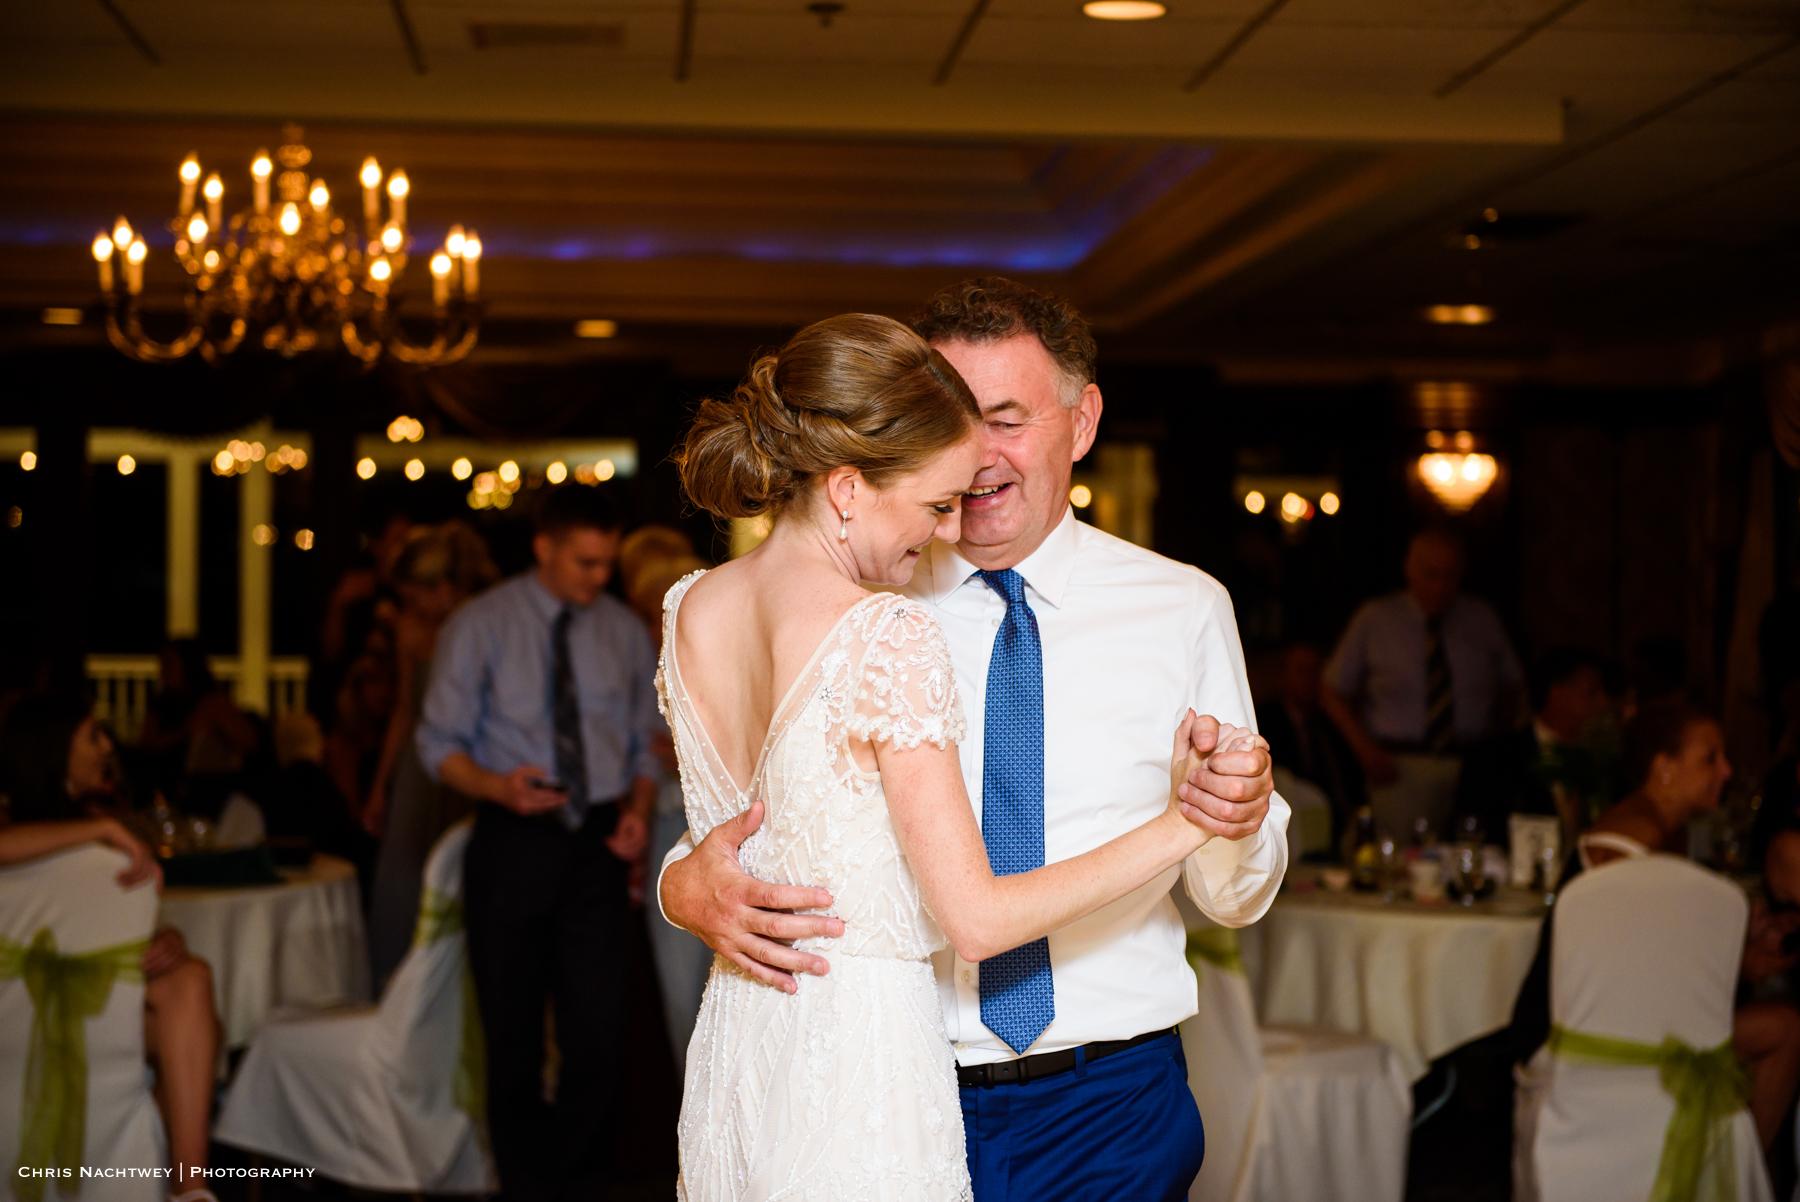 photos-wedding-quidnessett-country-club-ri-chris-nachtwey-photography-2018-53.jpg